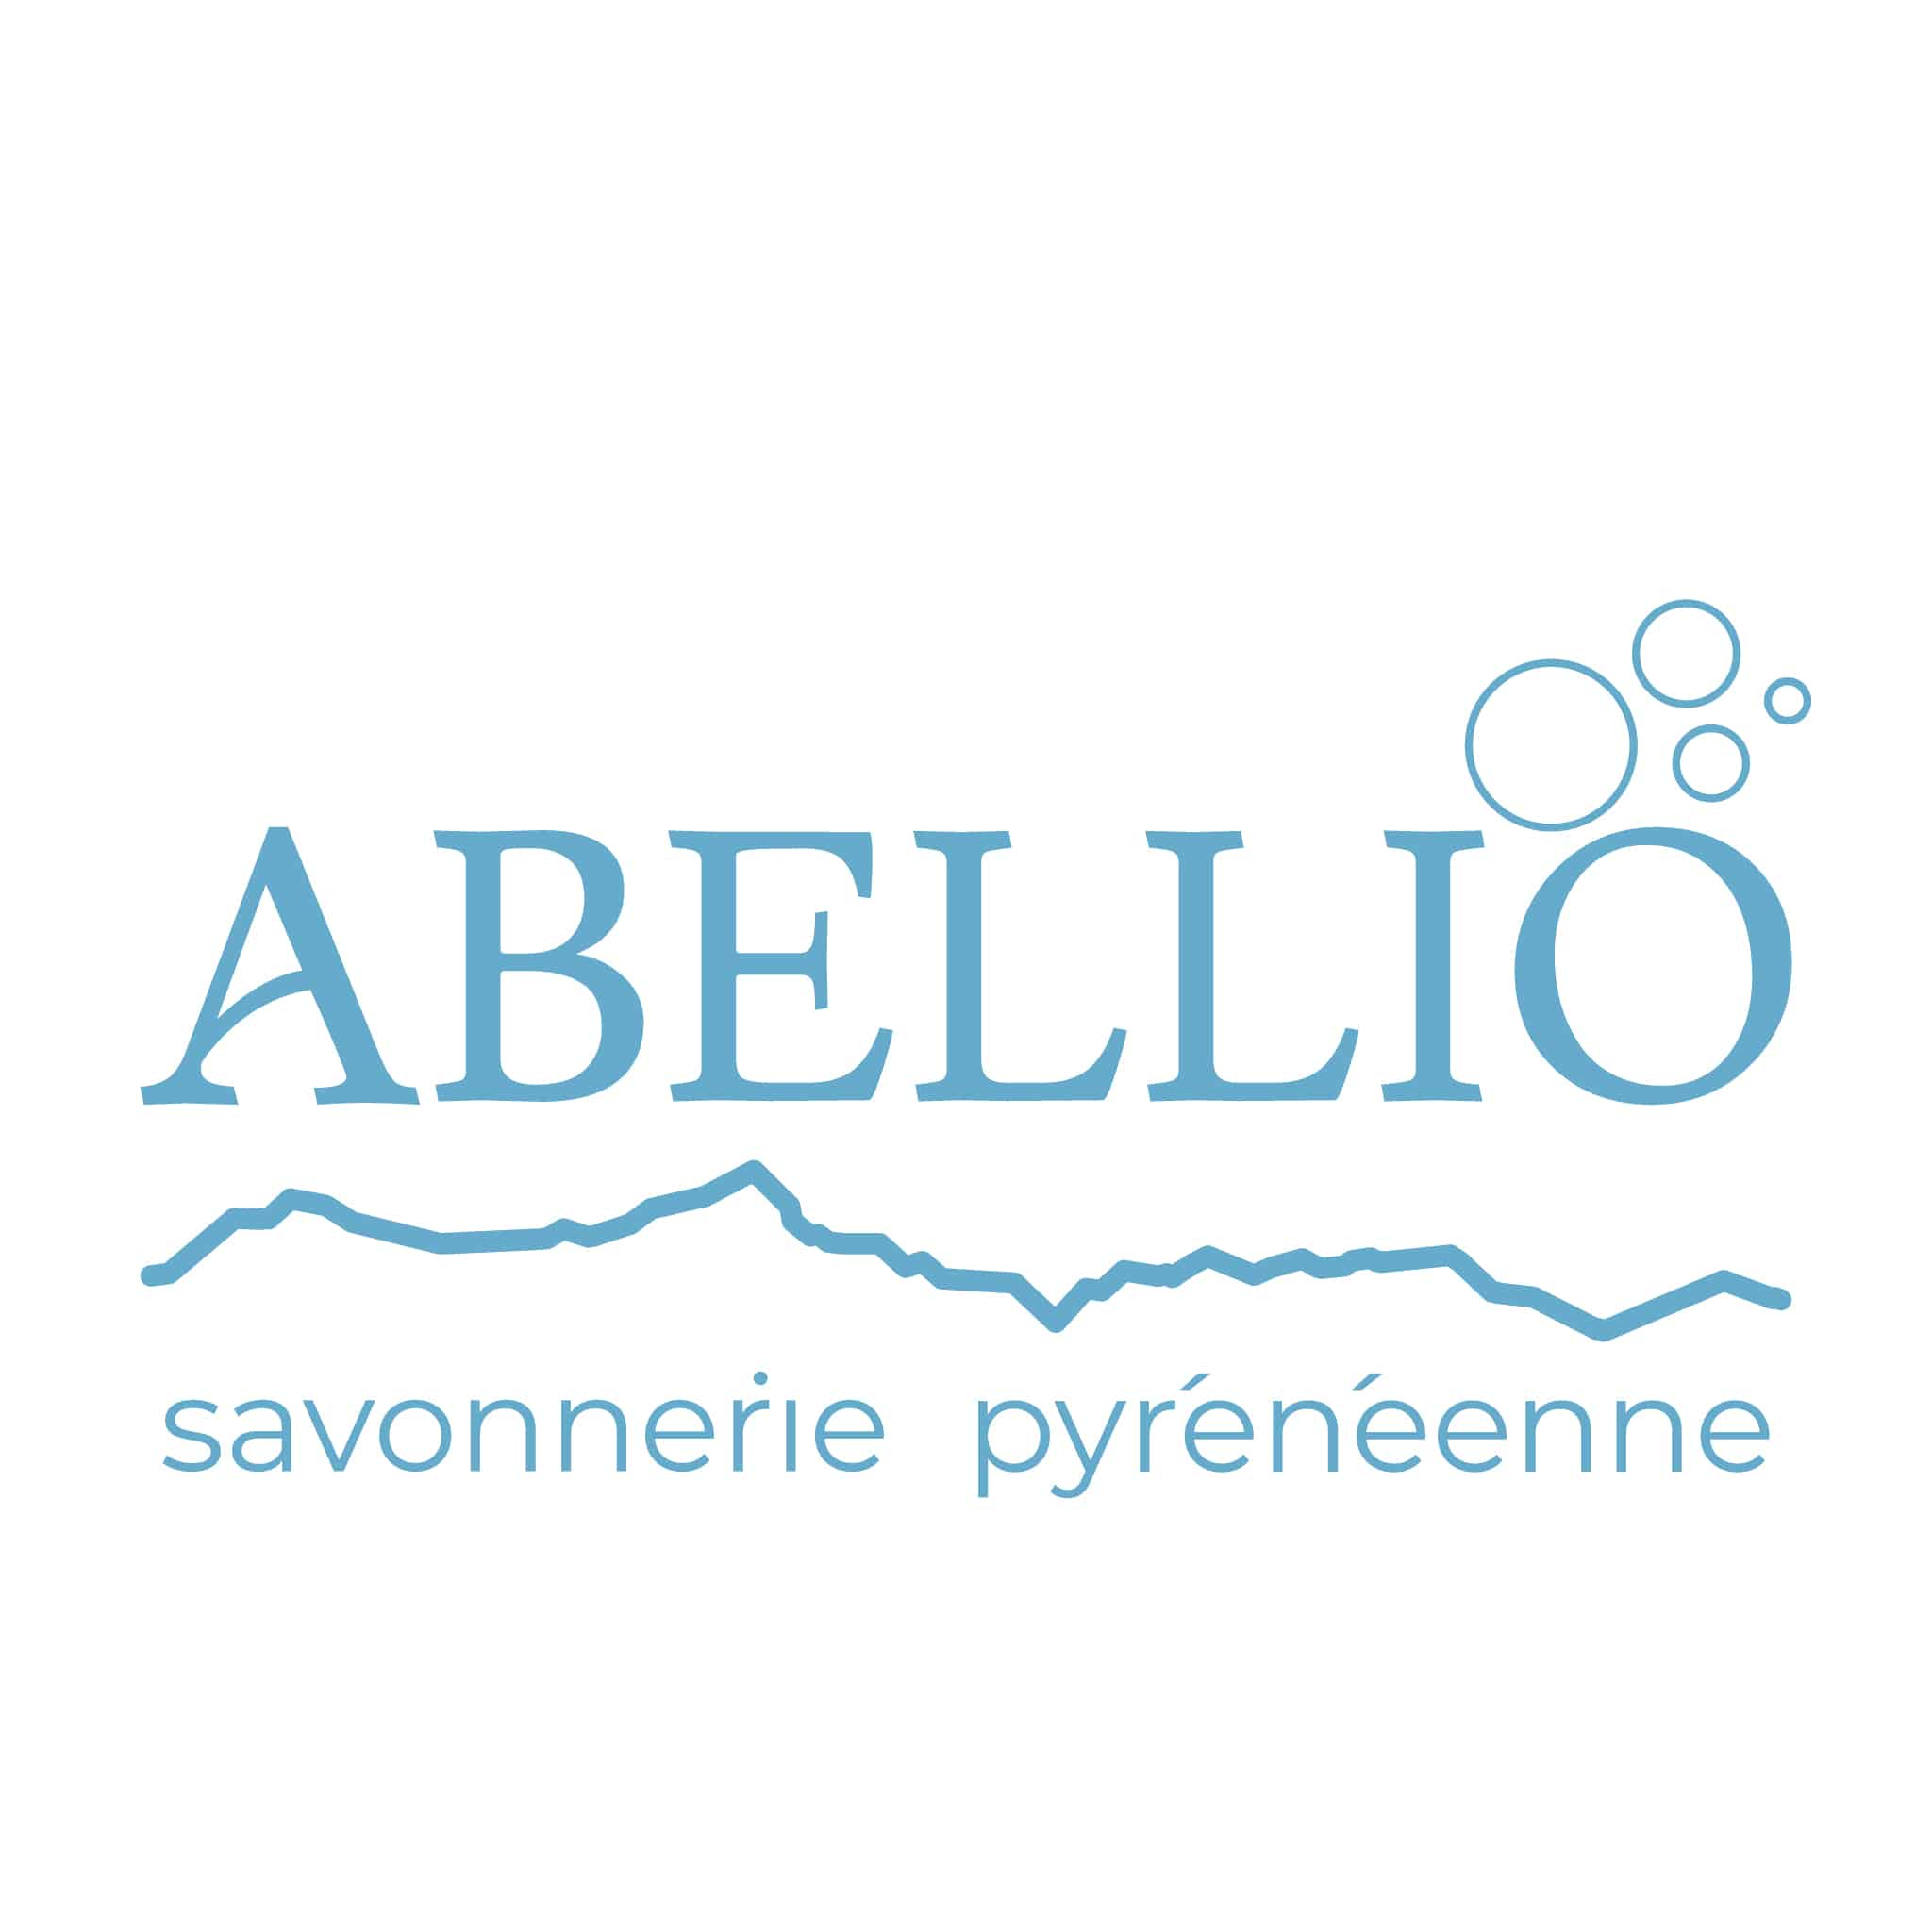 Abellio Savonnerie**